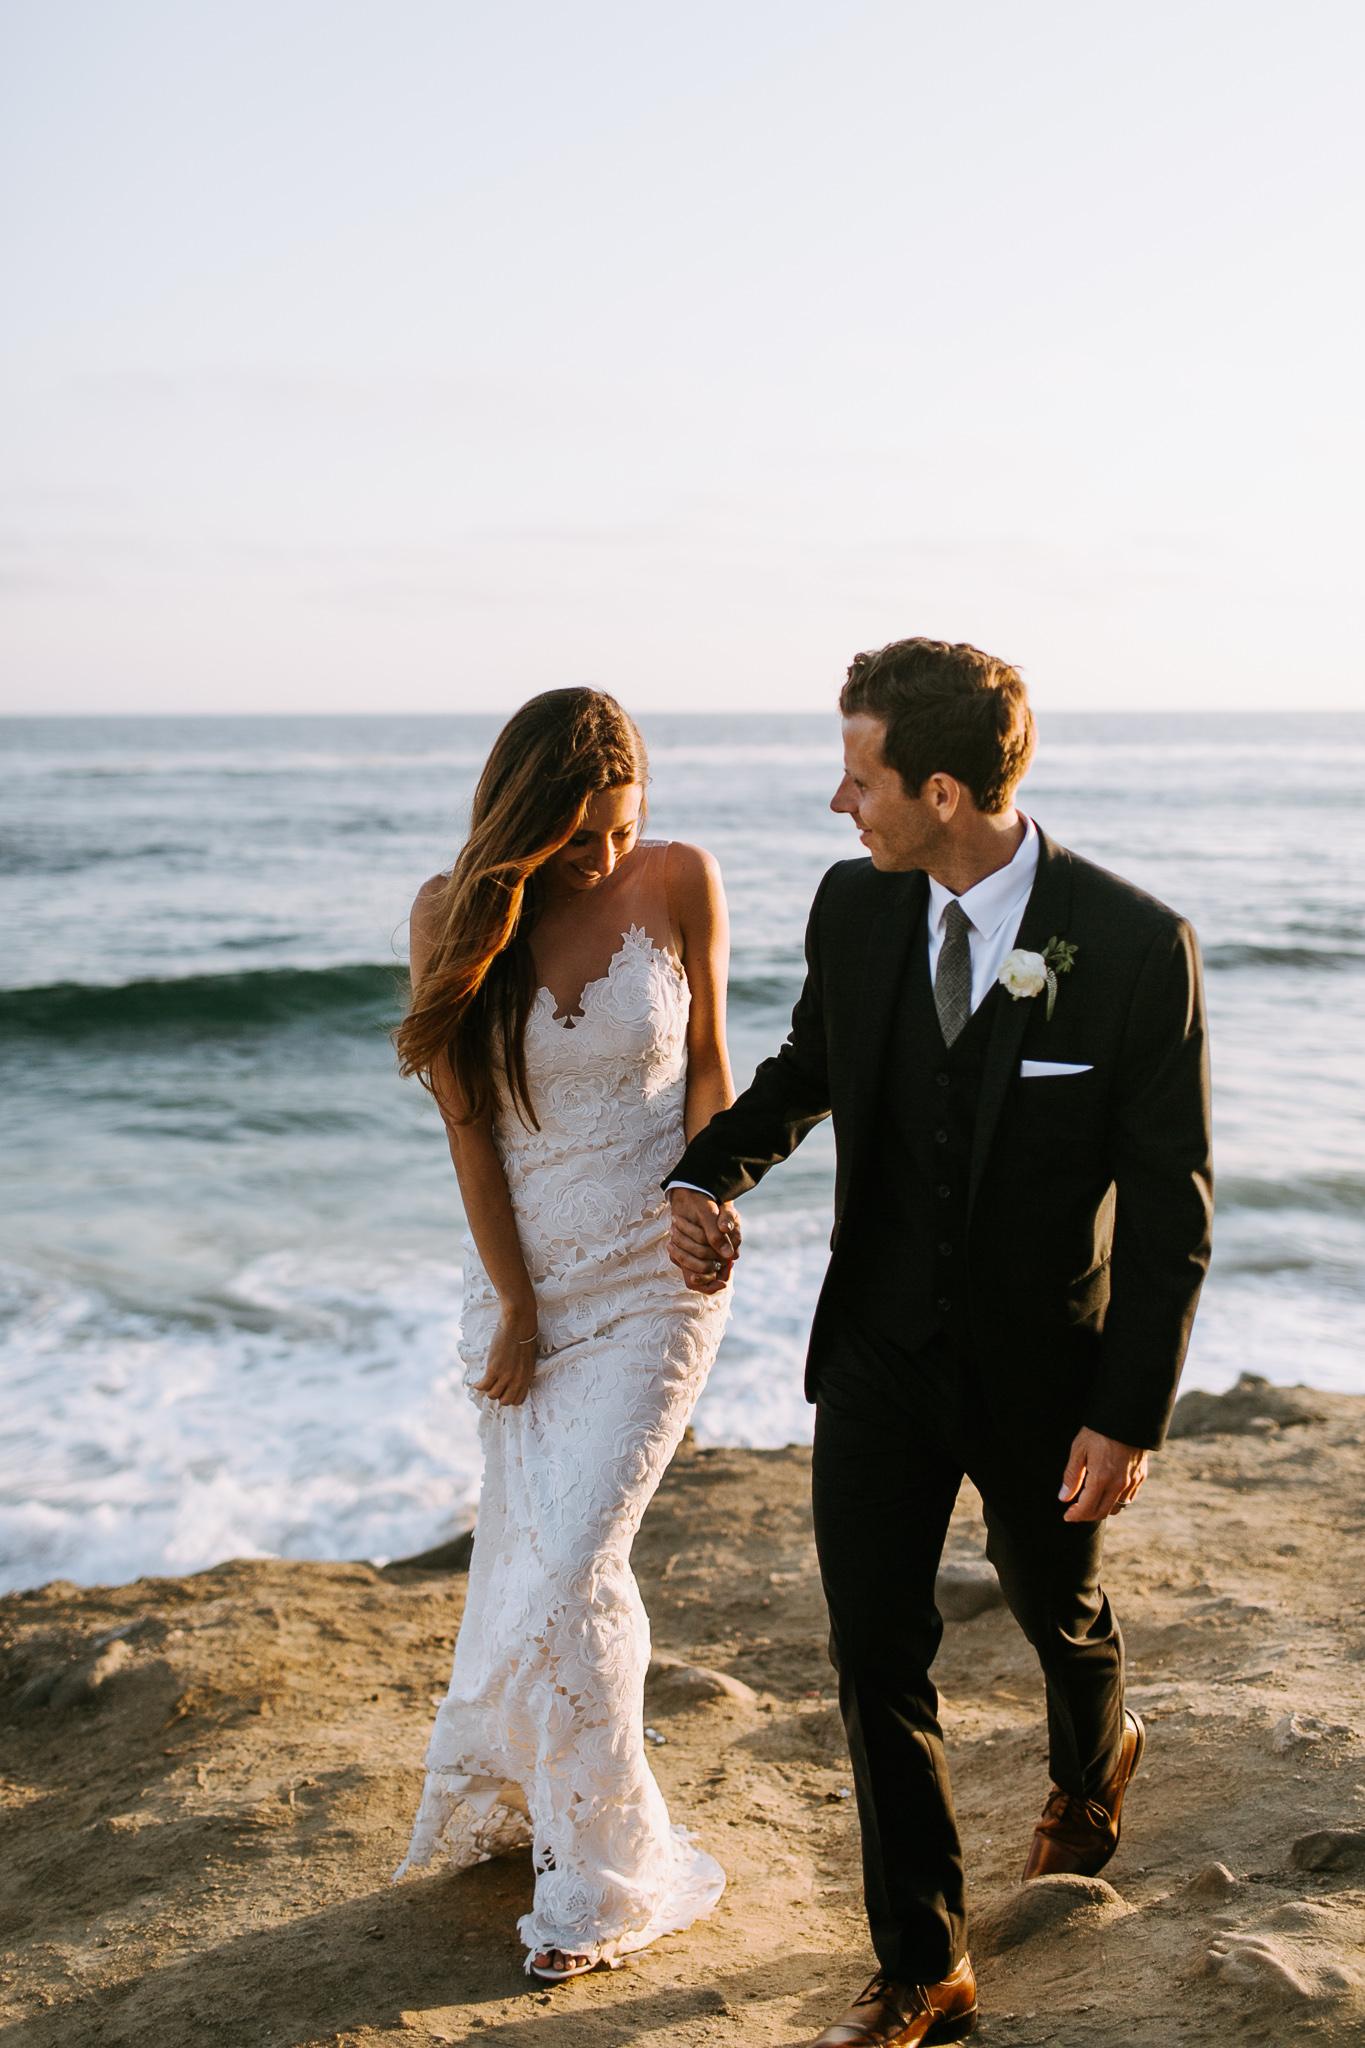 LagunaBeach-WeddingPhotographer-55.jpg